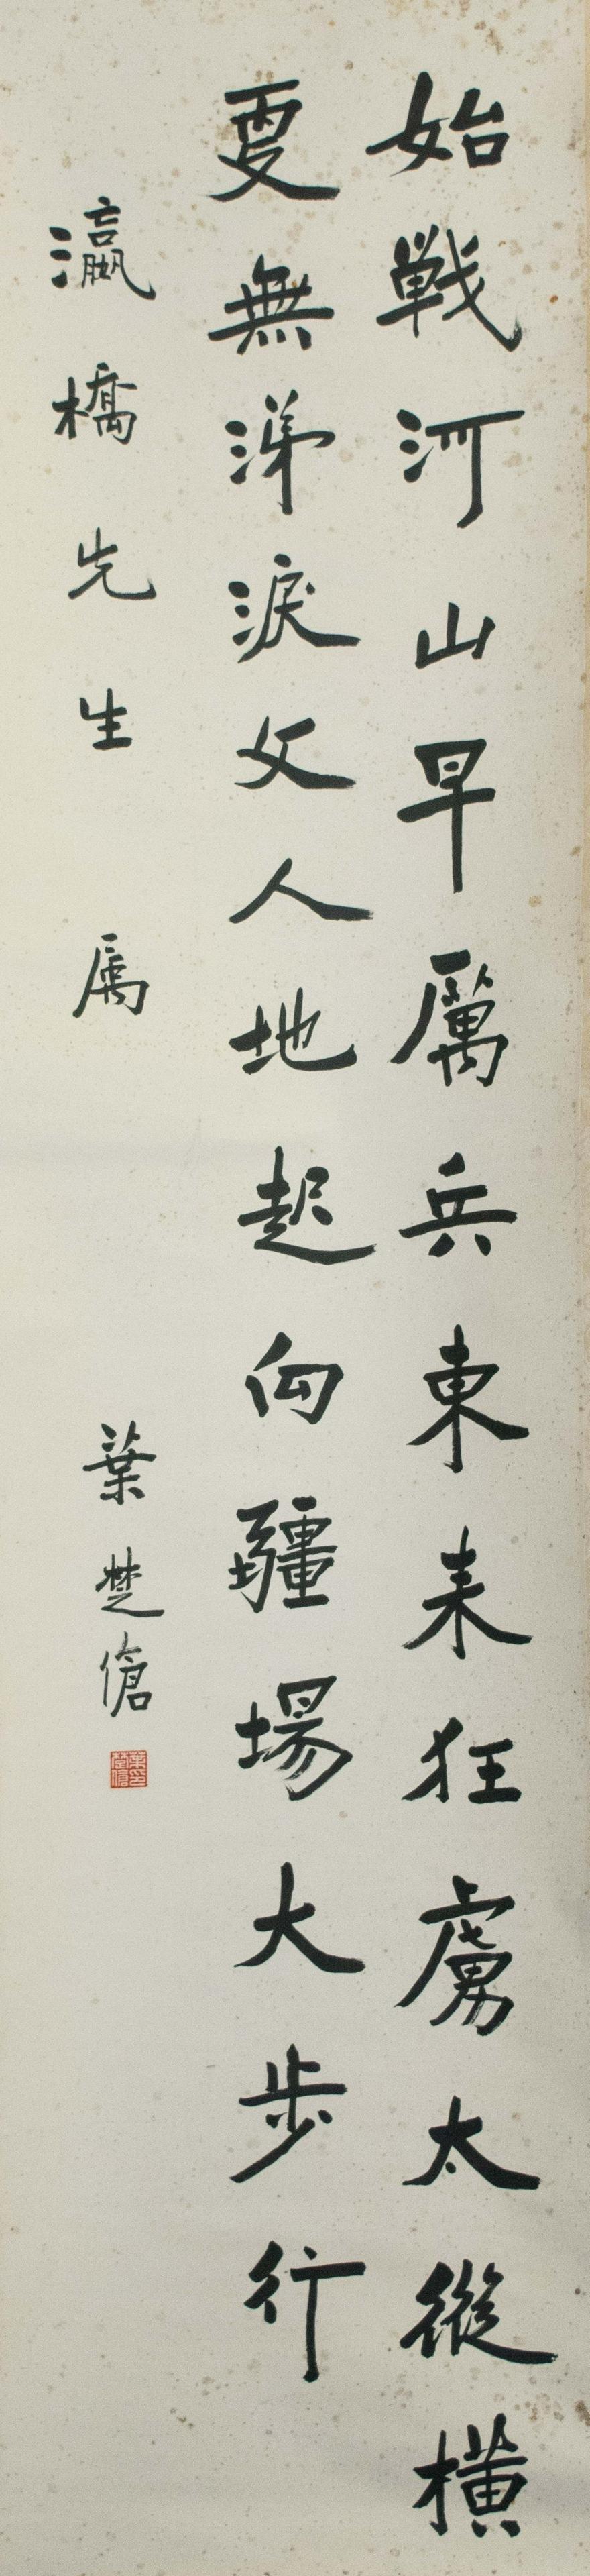 Chinese Calligraphy, Ye Chuchang Given to Tiehan